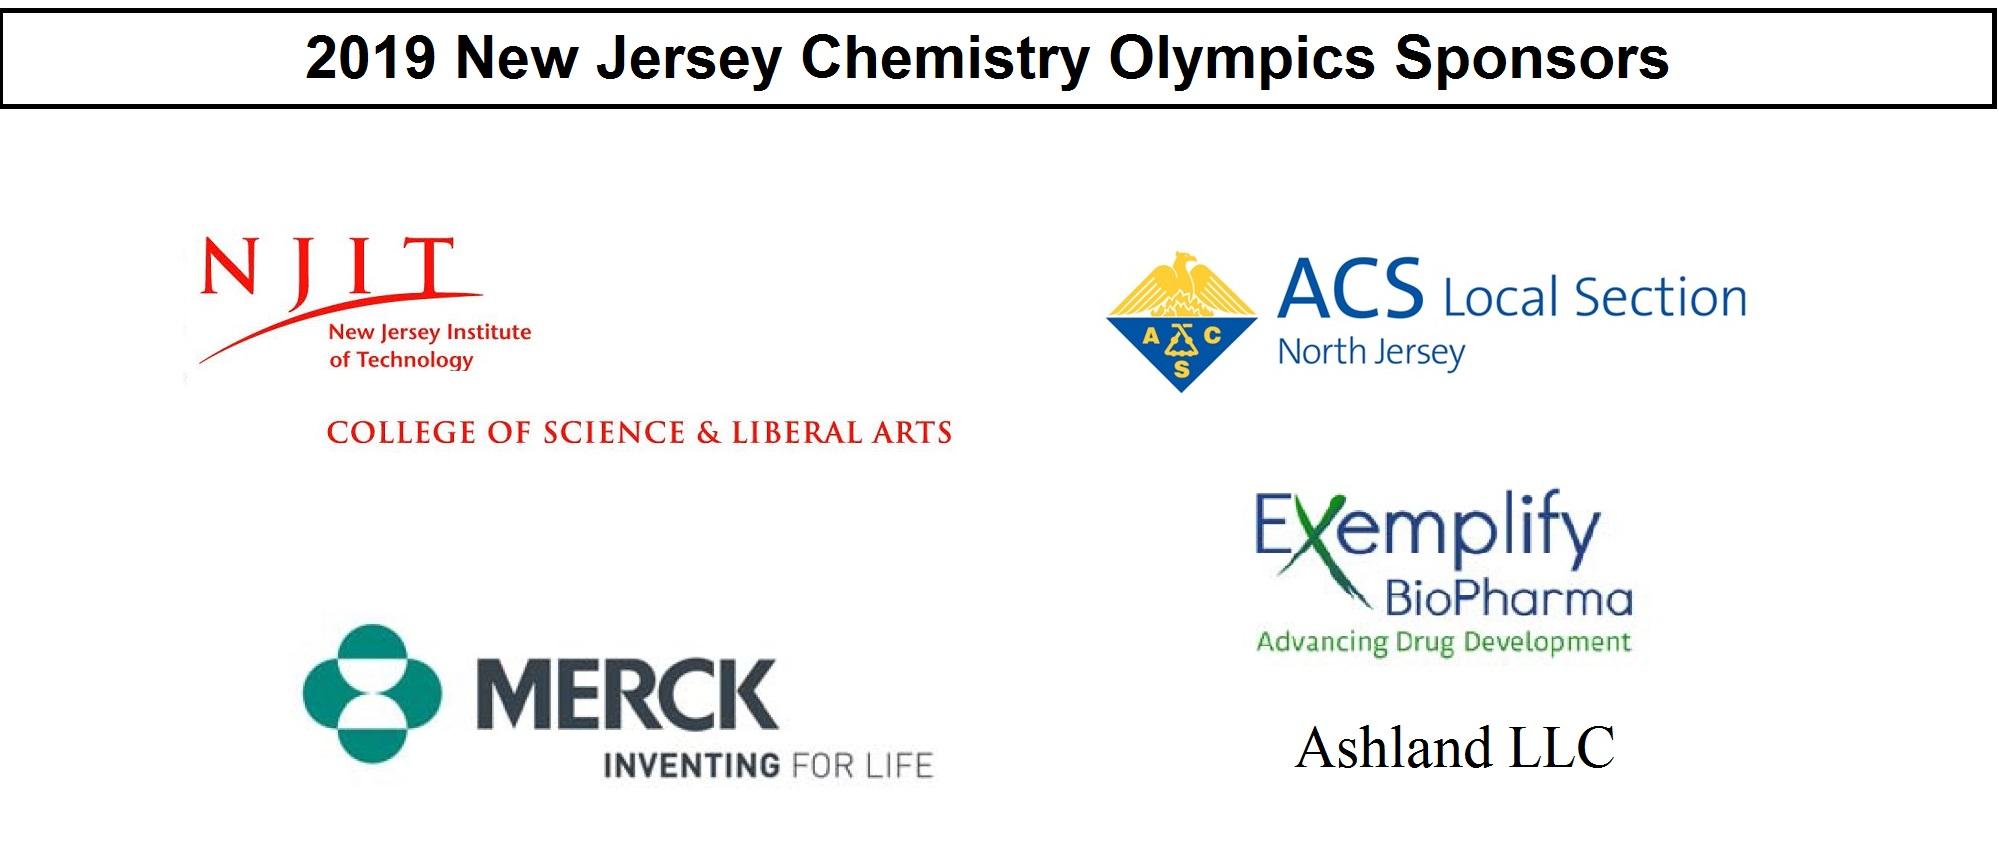 2019 NJCO sponsors - NJIT, ACS, Merck, Exemplify, Ashland